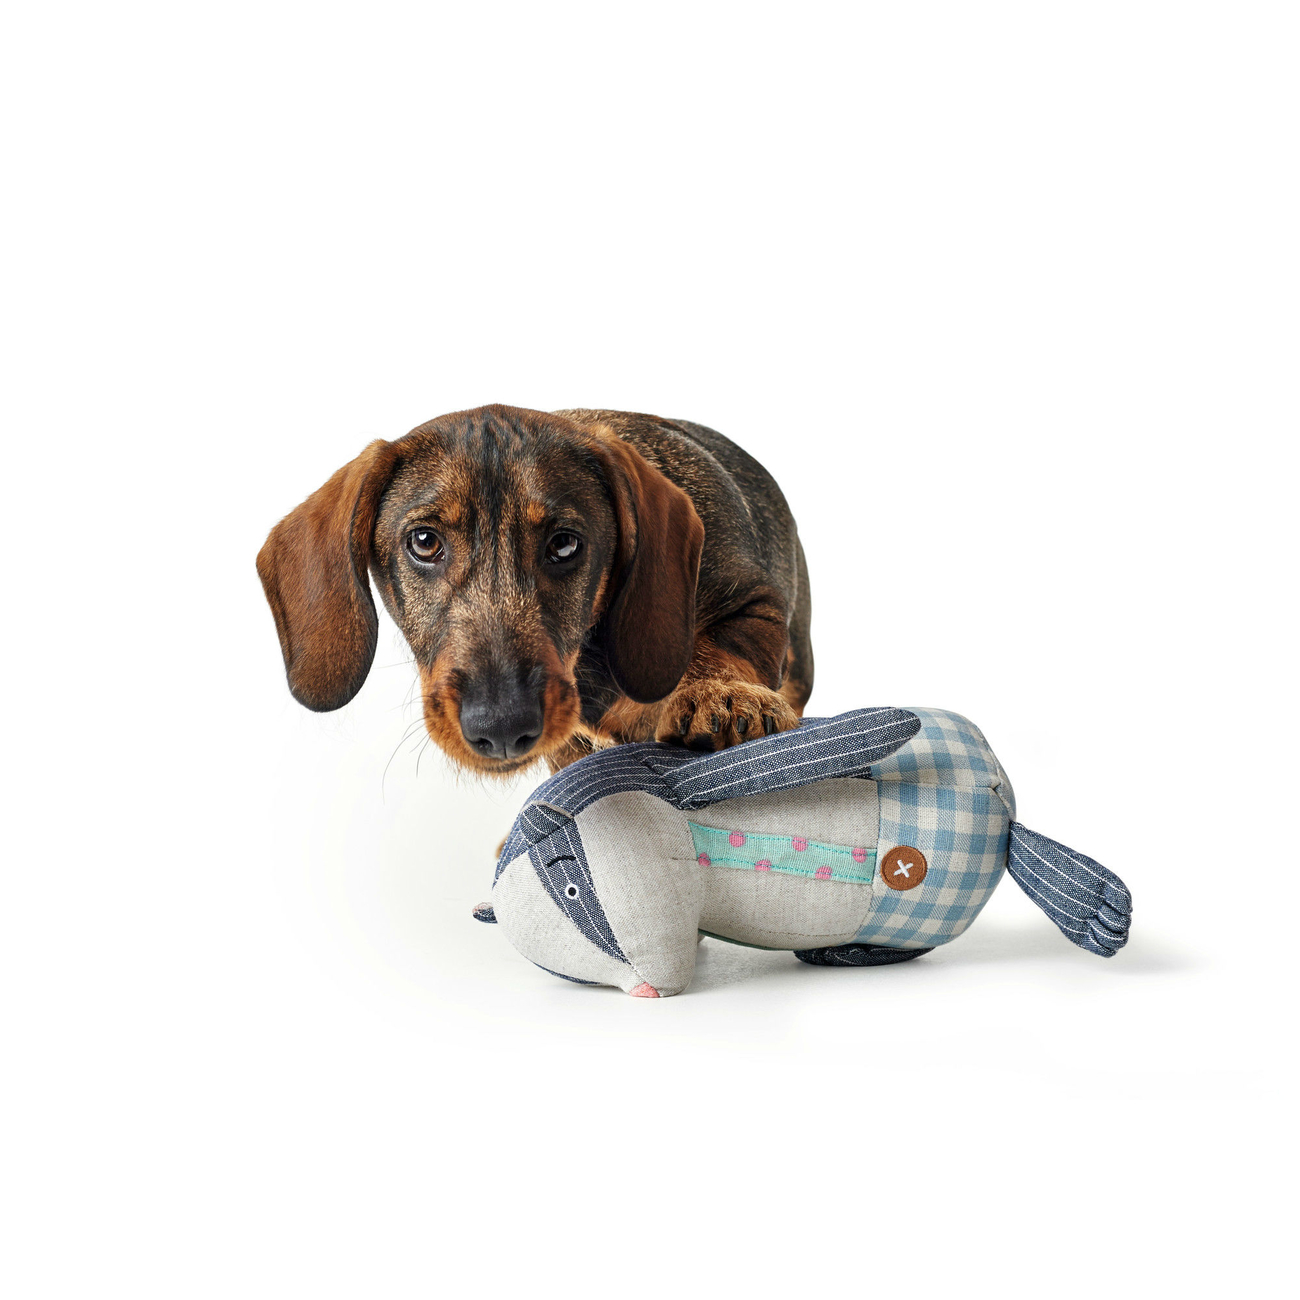 Hunter Hundespielzeug Tanami 65277, Bild 6